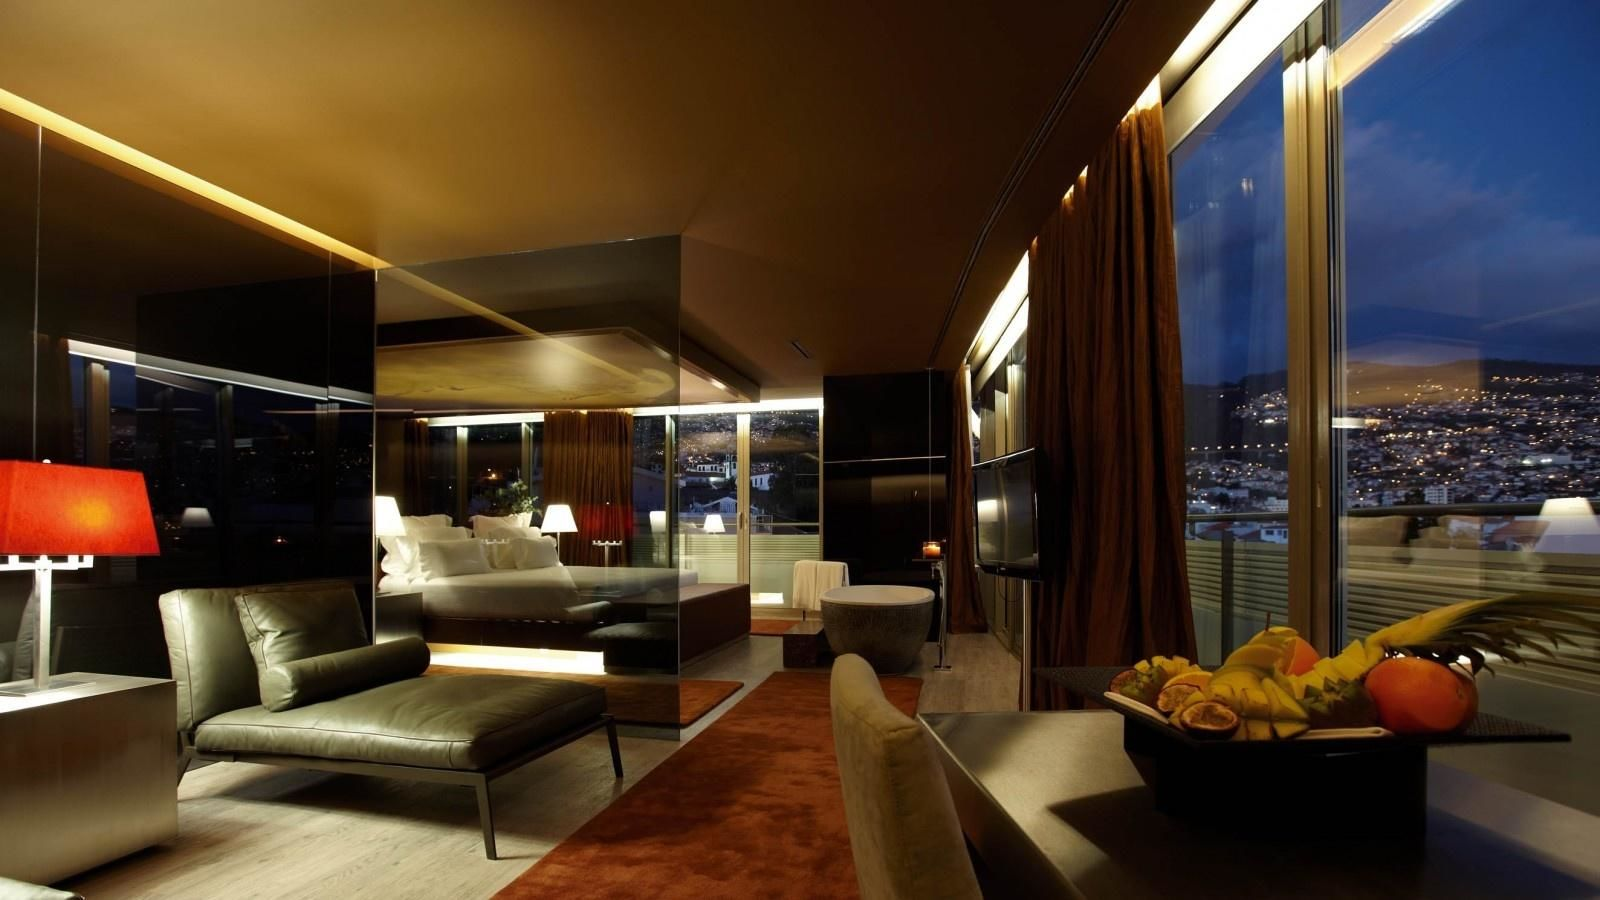 The Vine Hotel - Rooms